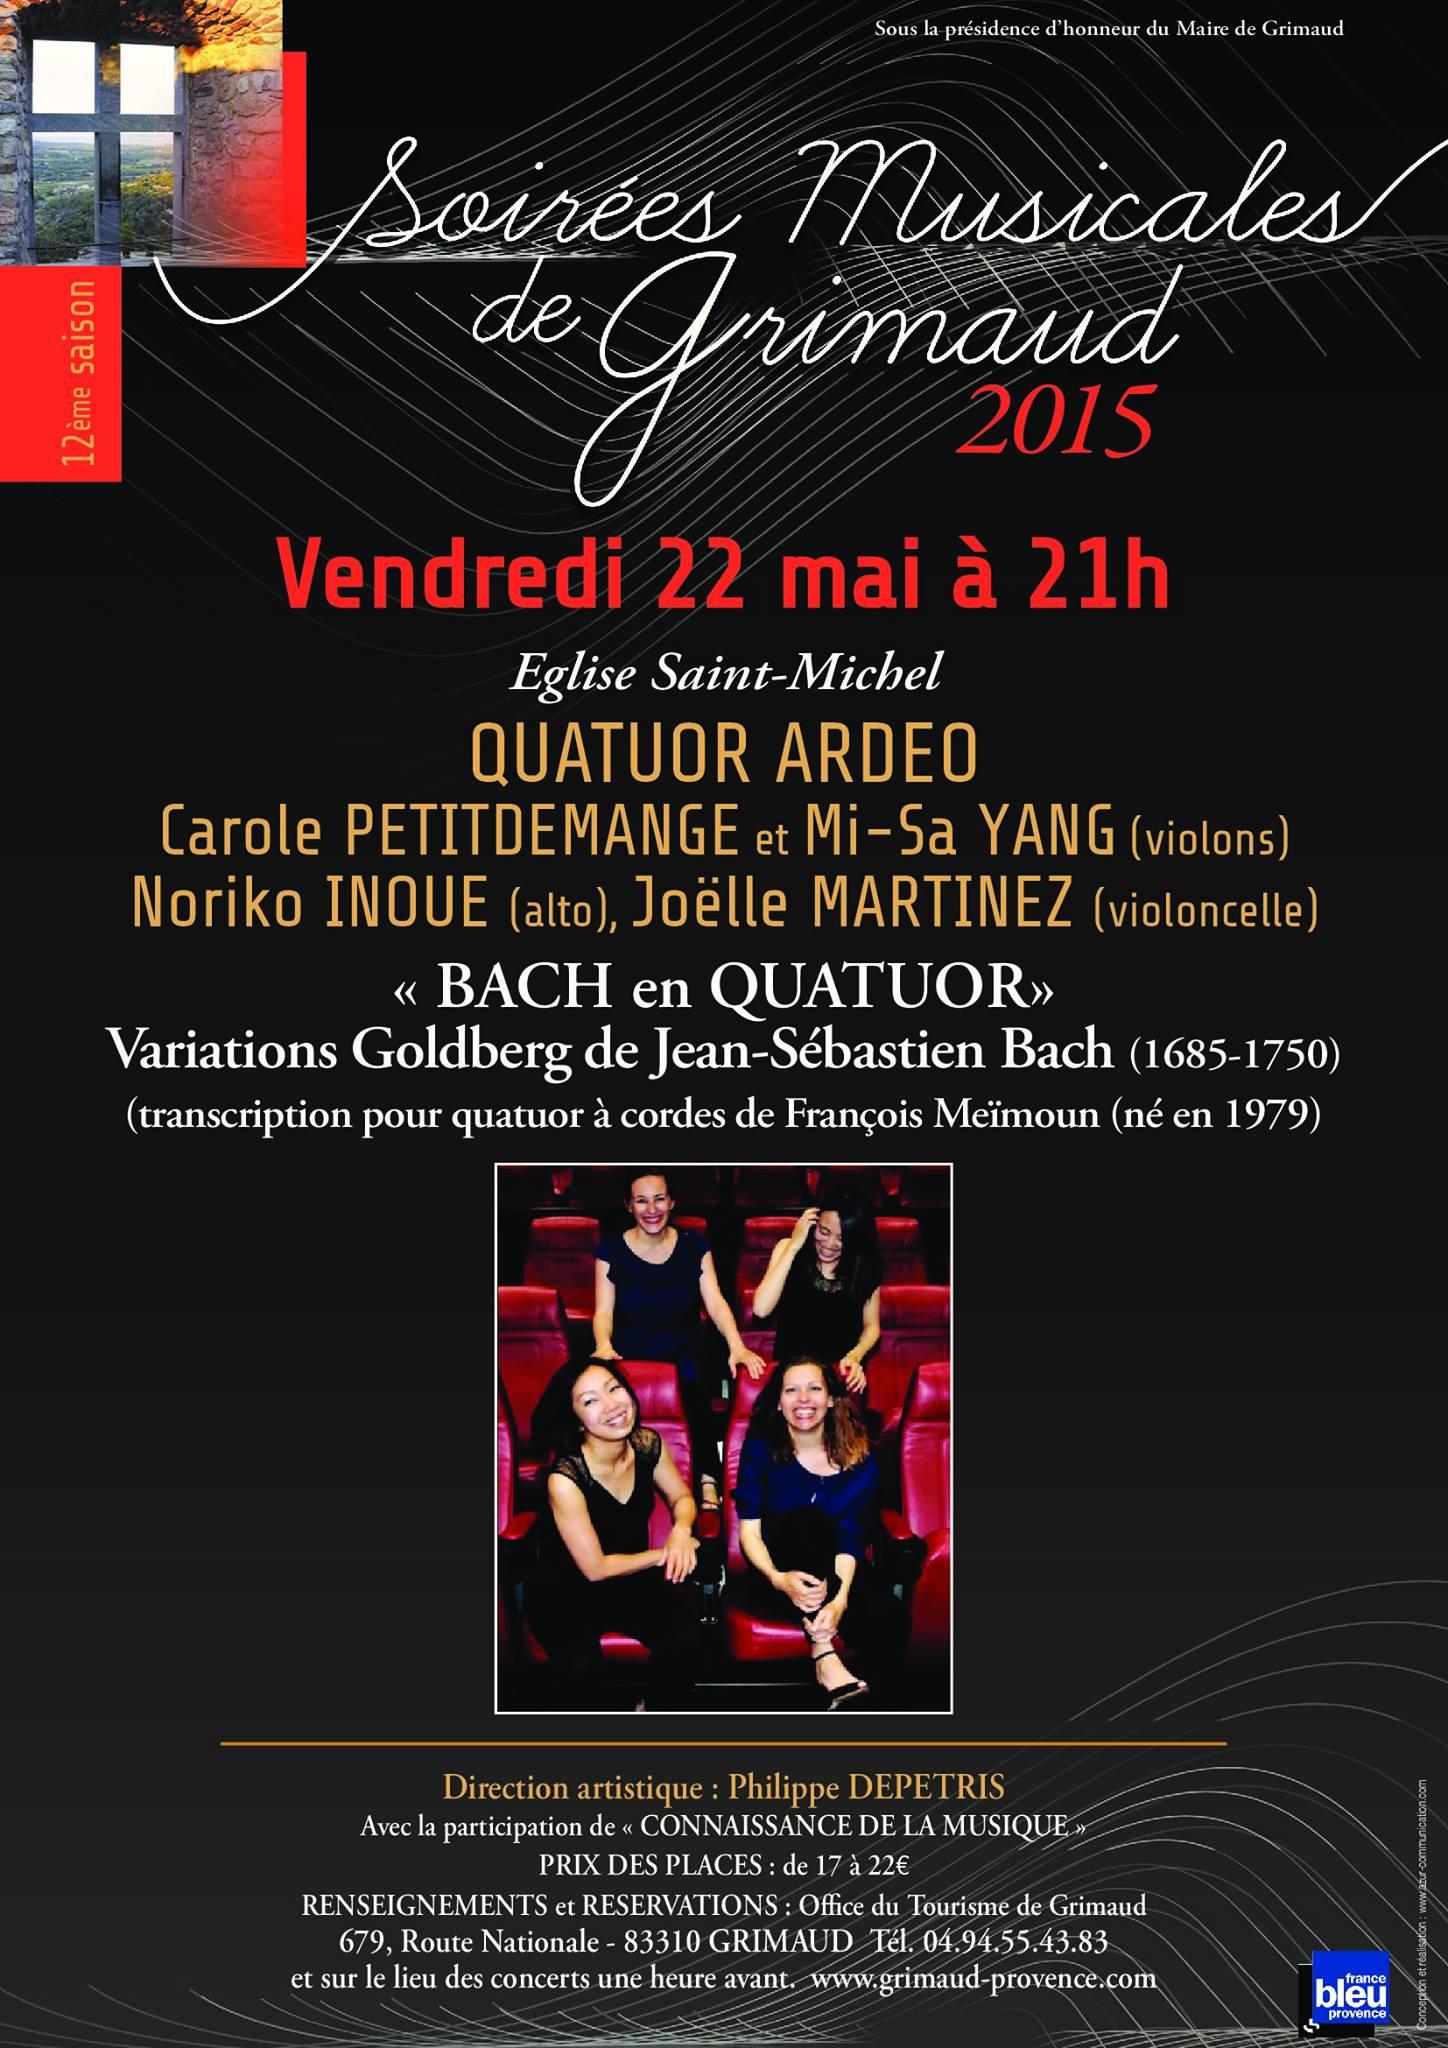 Soirée-Musicale-Grimaud-Mai-2015